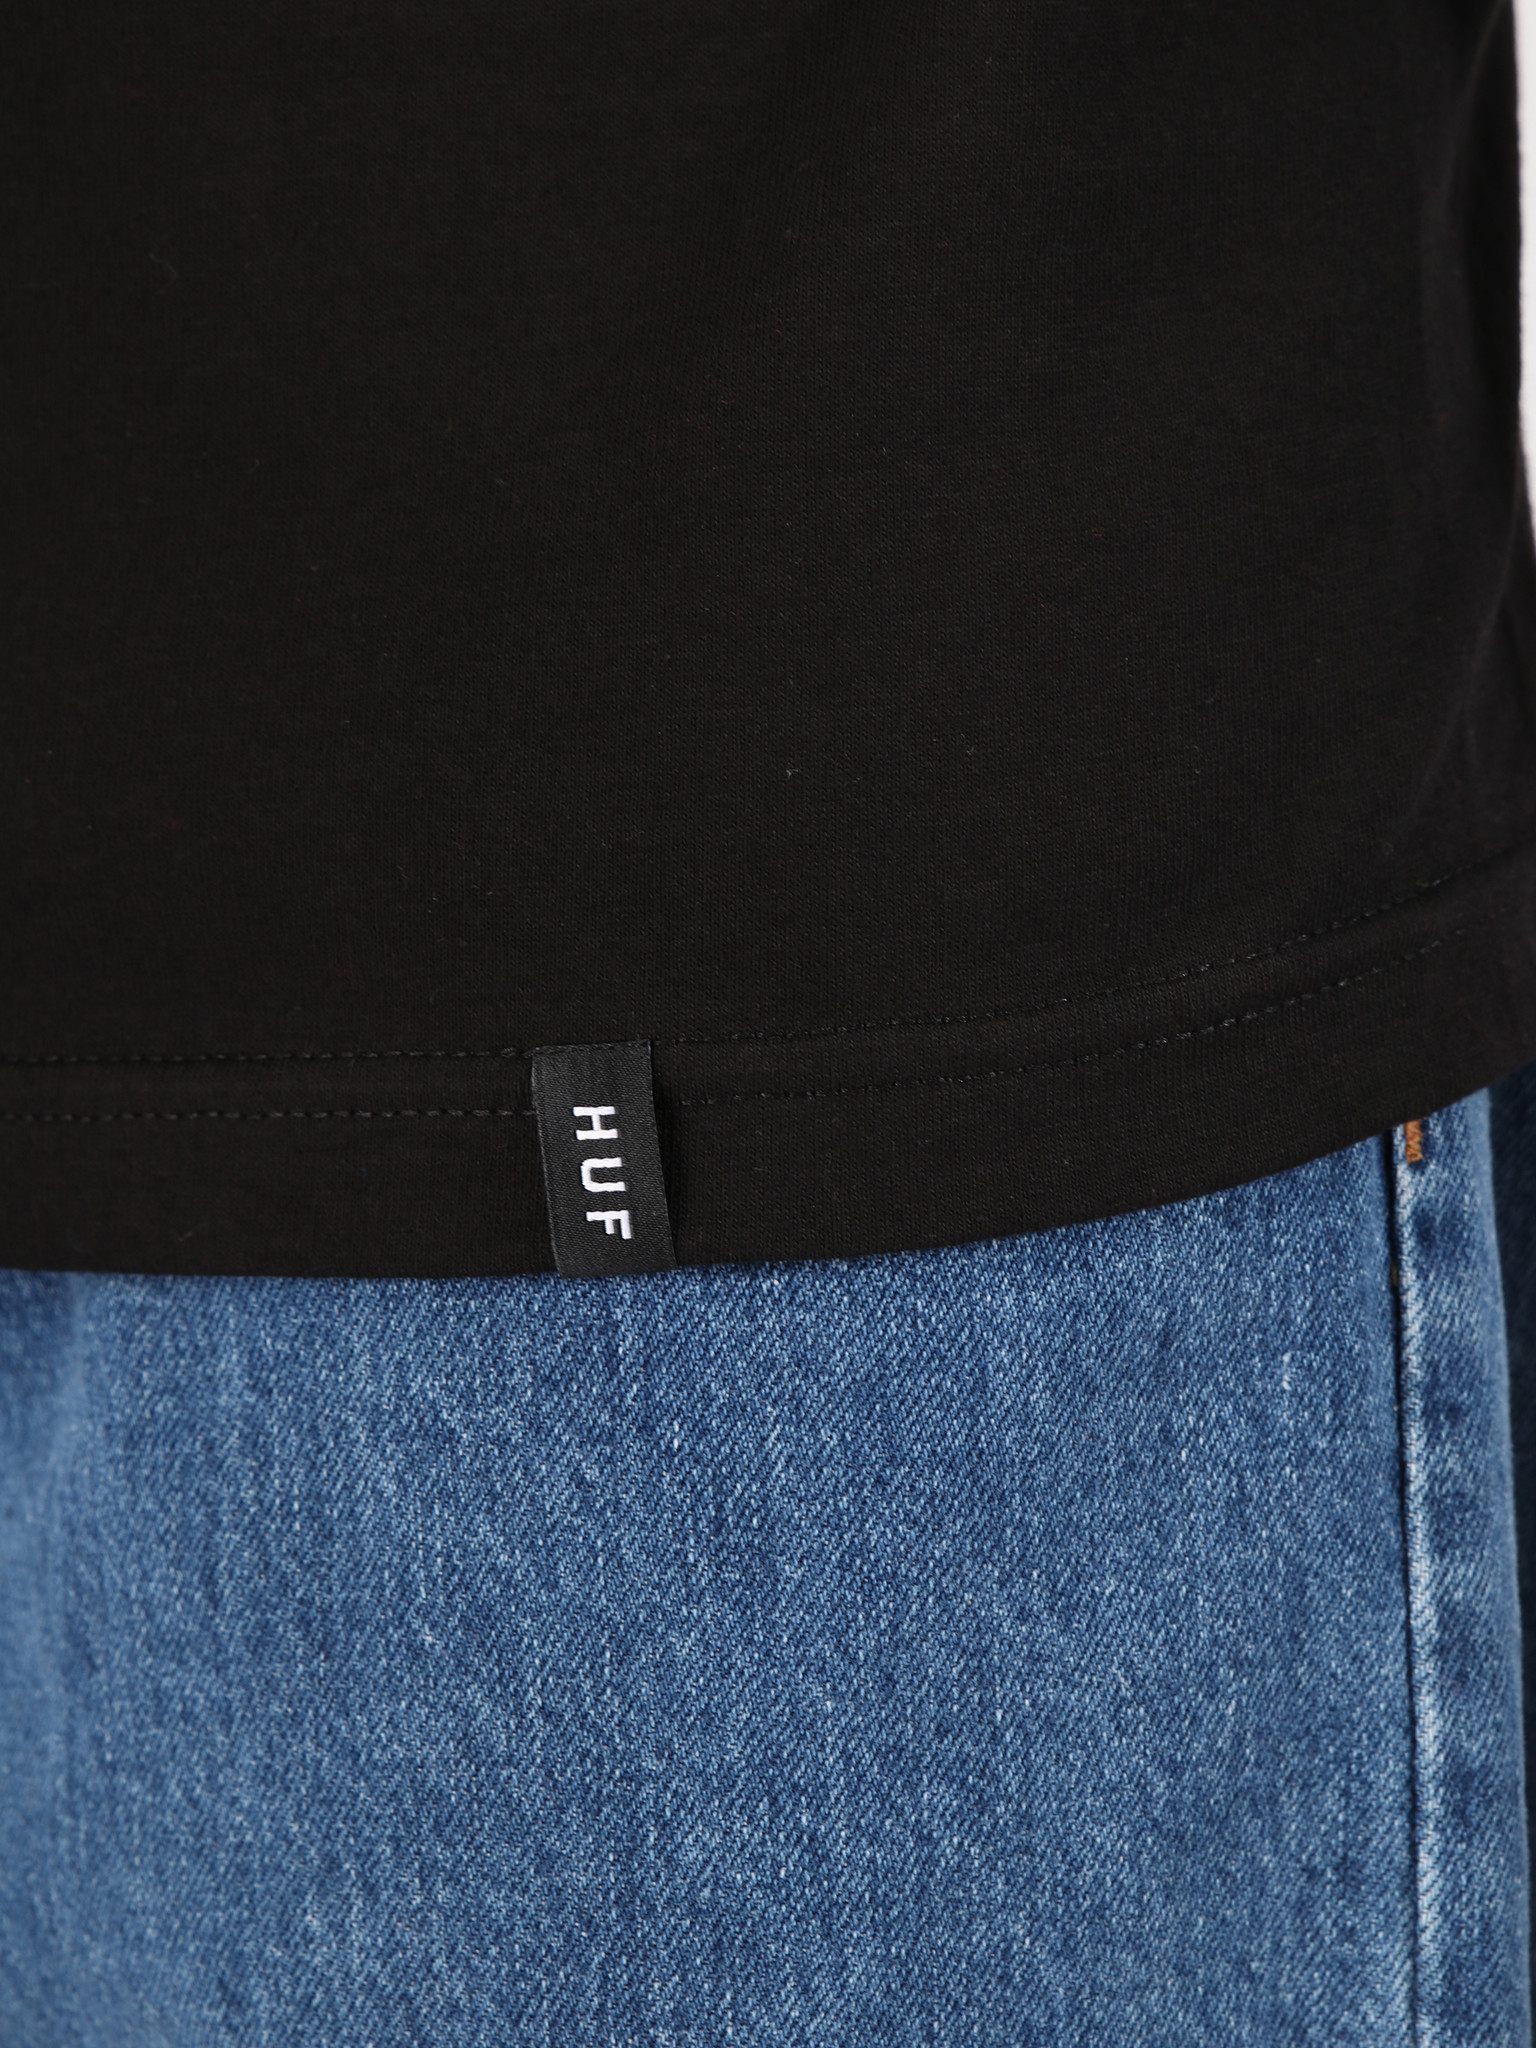 f76a6b4f HUF Bodega Longsleeve Black TS00564 | FRESHCOTTON